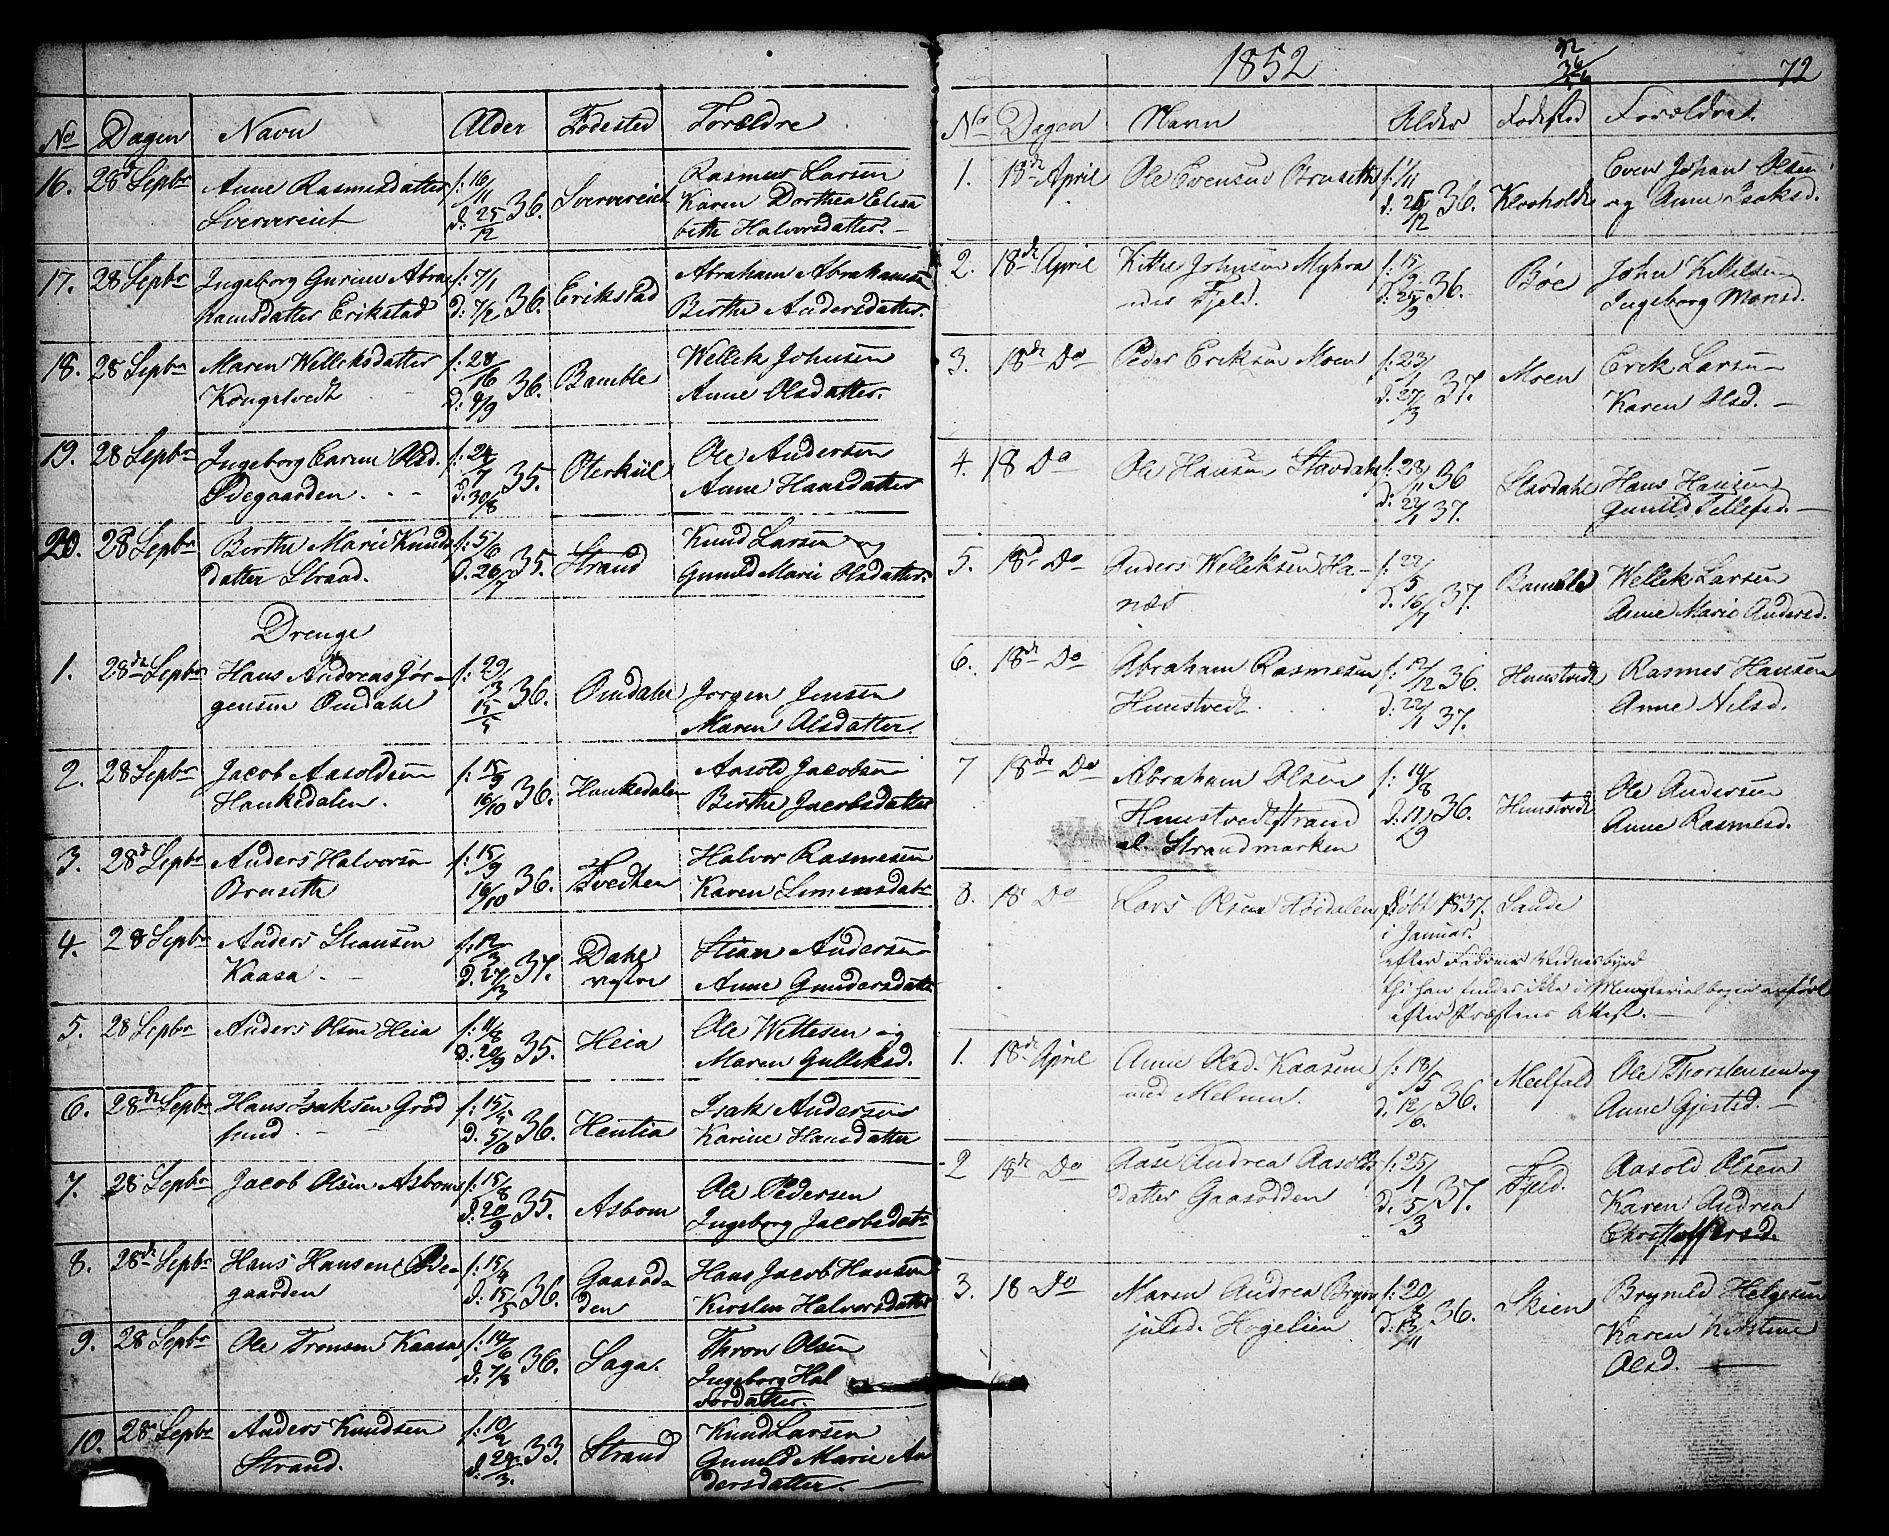 SAKO, Solum kirkebøker, G/Gb/L0001: Klokkerbok nr. II 1, 1848-1859, s. 72